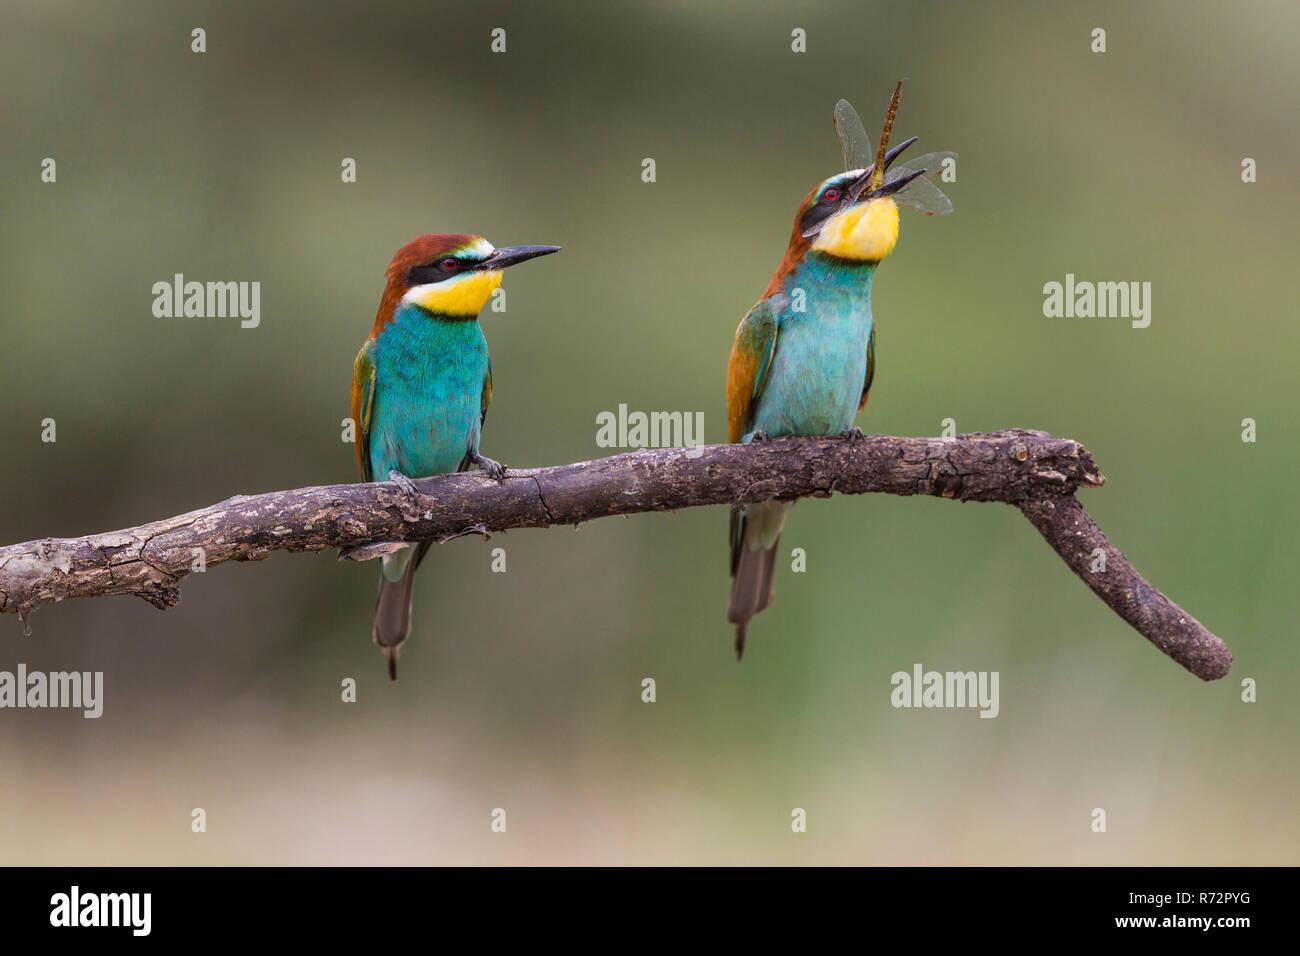 Bee-eater, Romania, (Merops apiaster) Stock Photo